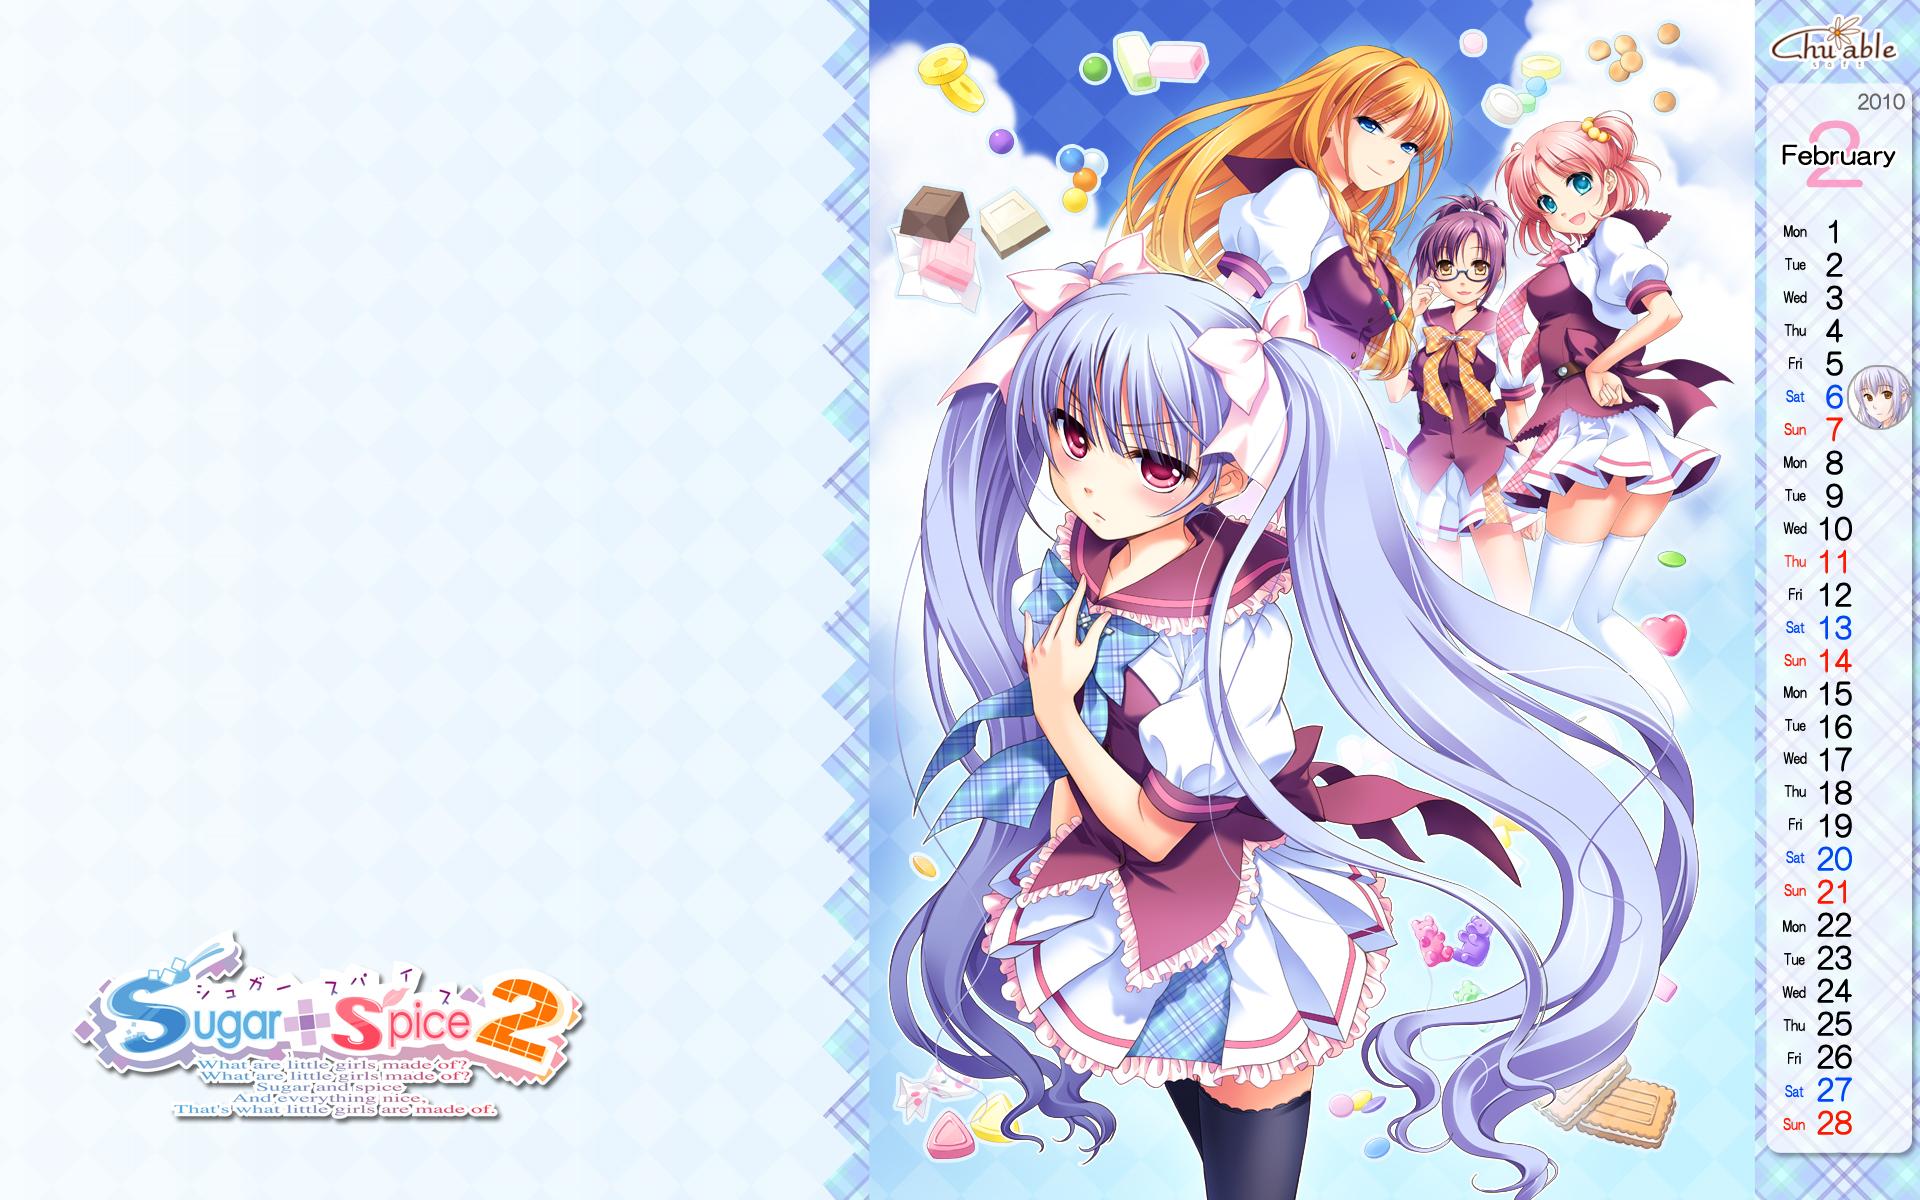 amamoto_fuuka calendar chuablesoft ginta hiiragi_ginga ribbons sugar+spice_2 tagme tanegashima_sana tohno_kaoruko twintails